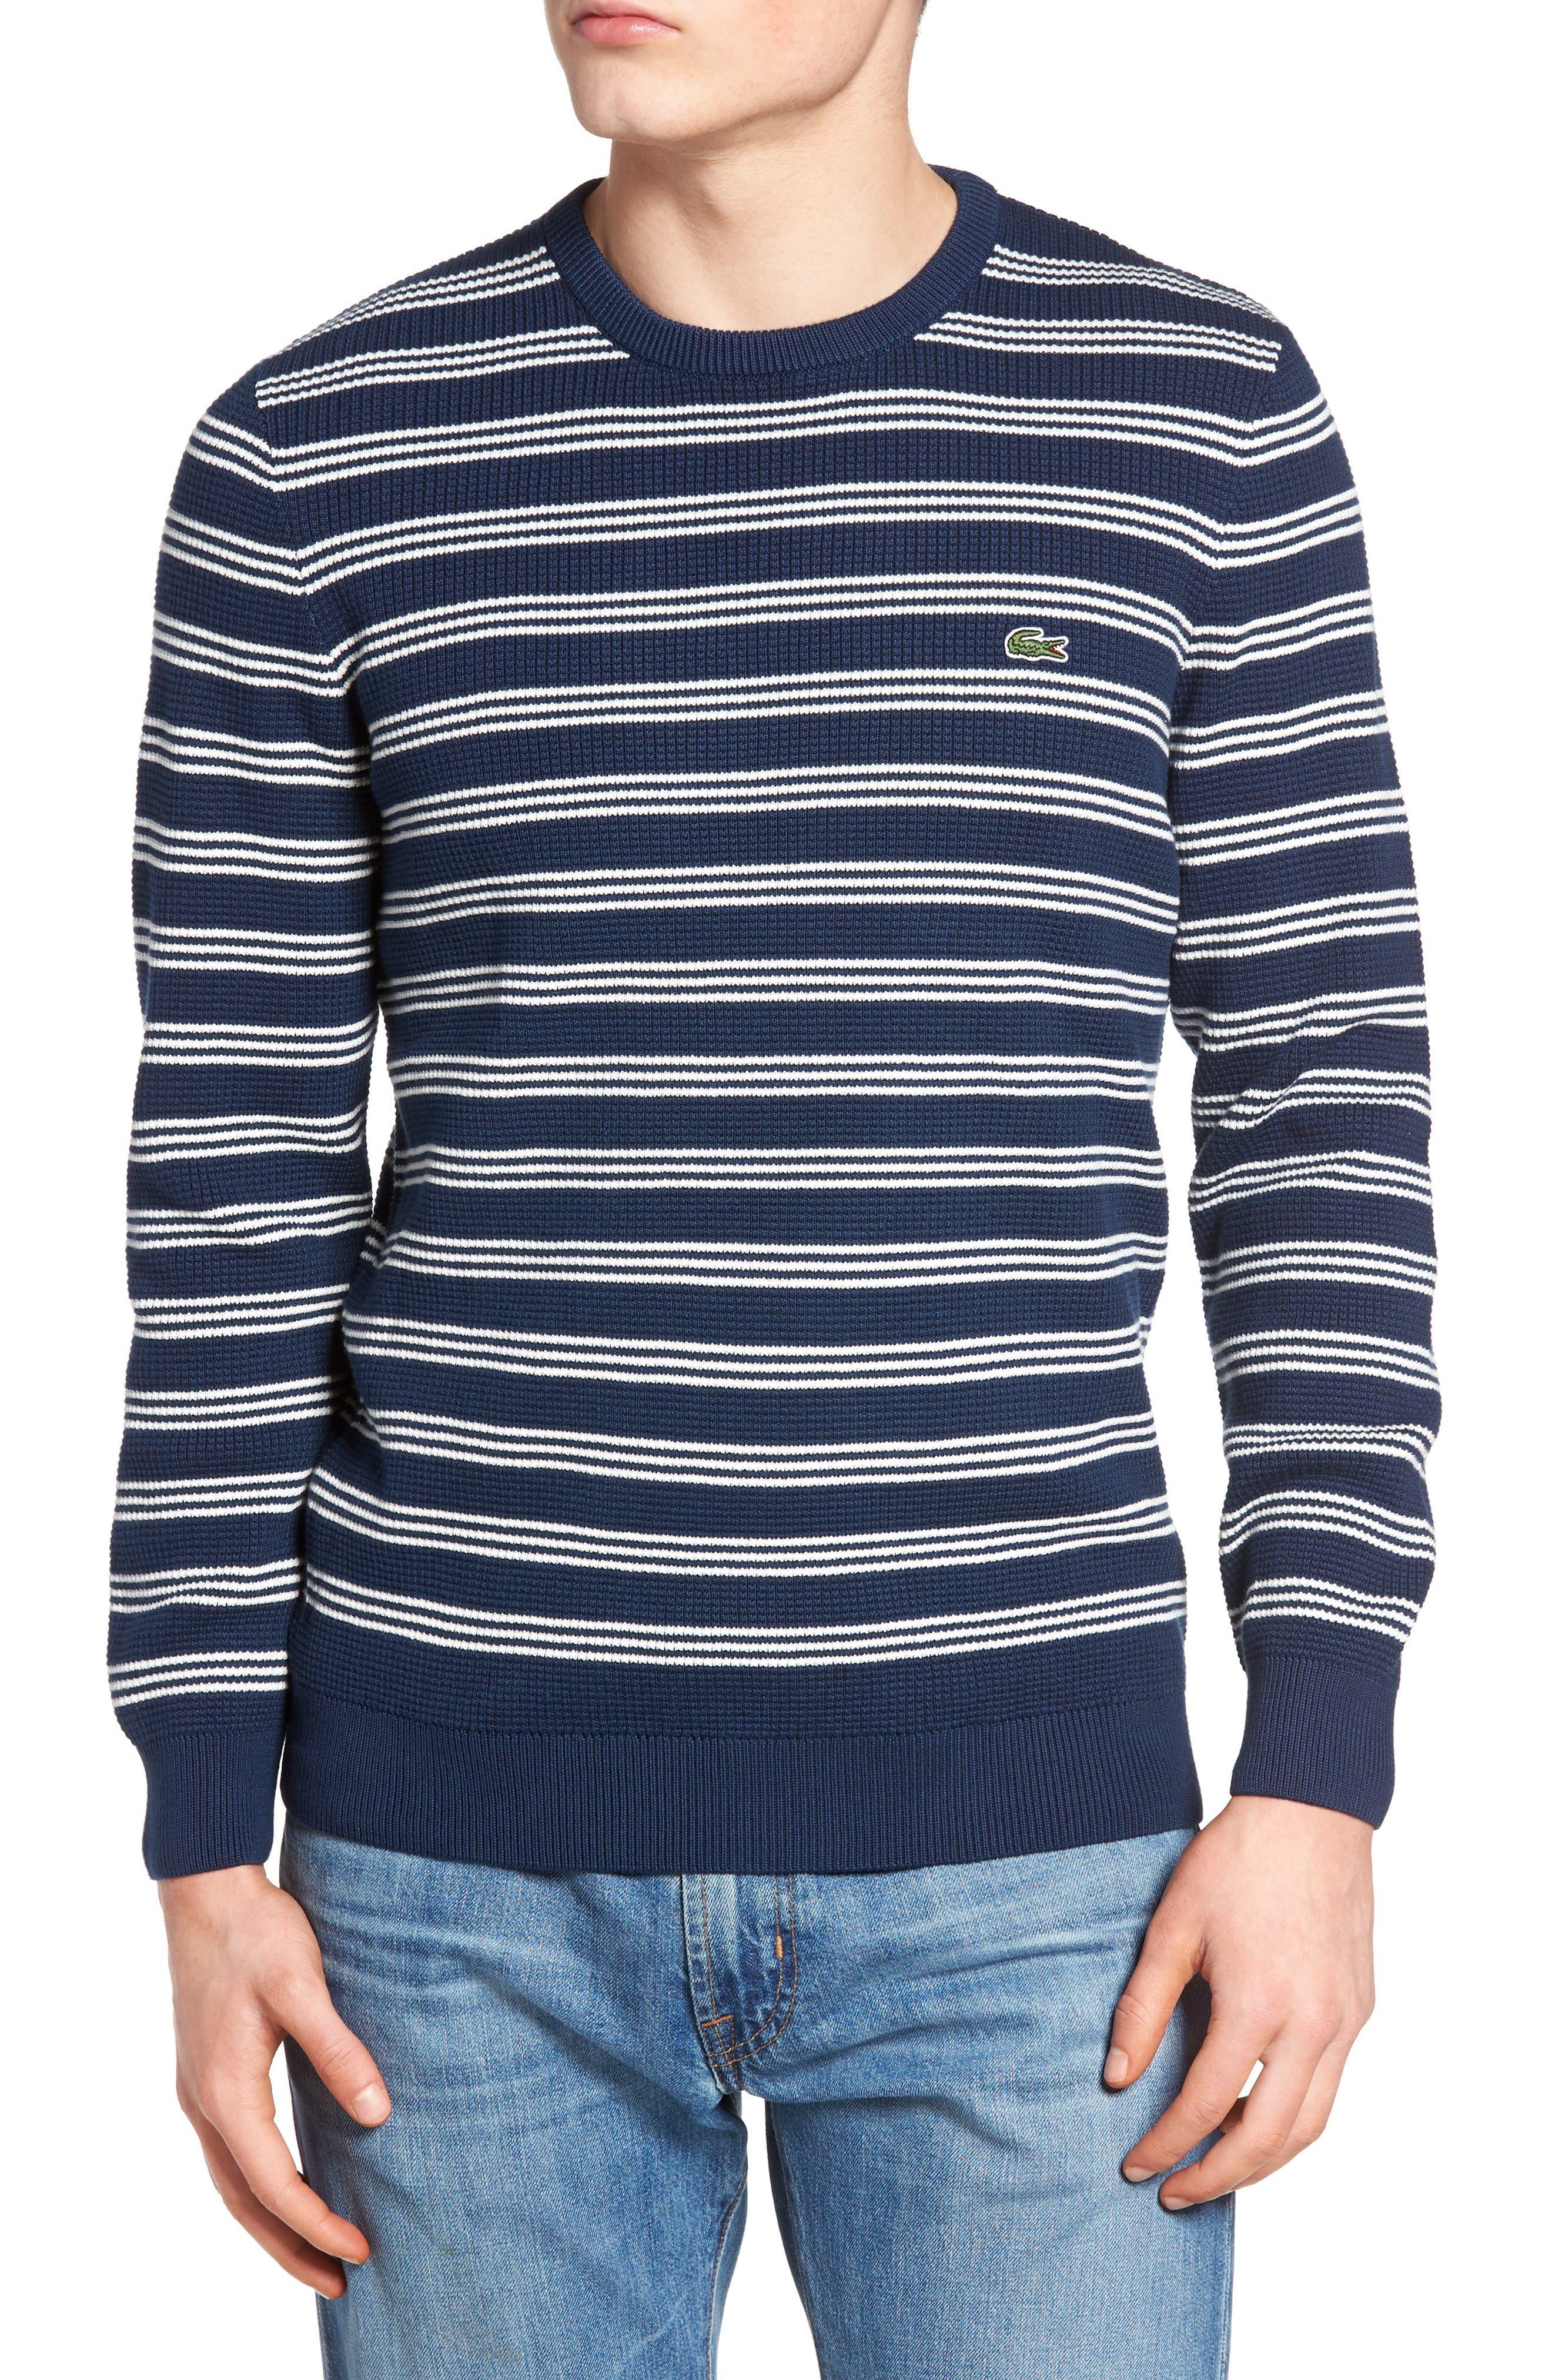 Lacoste Waffle Stitch Stripe Sweater